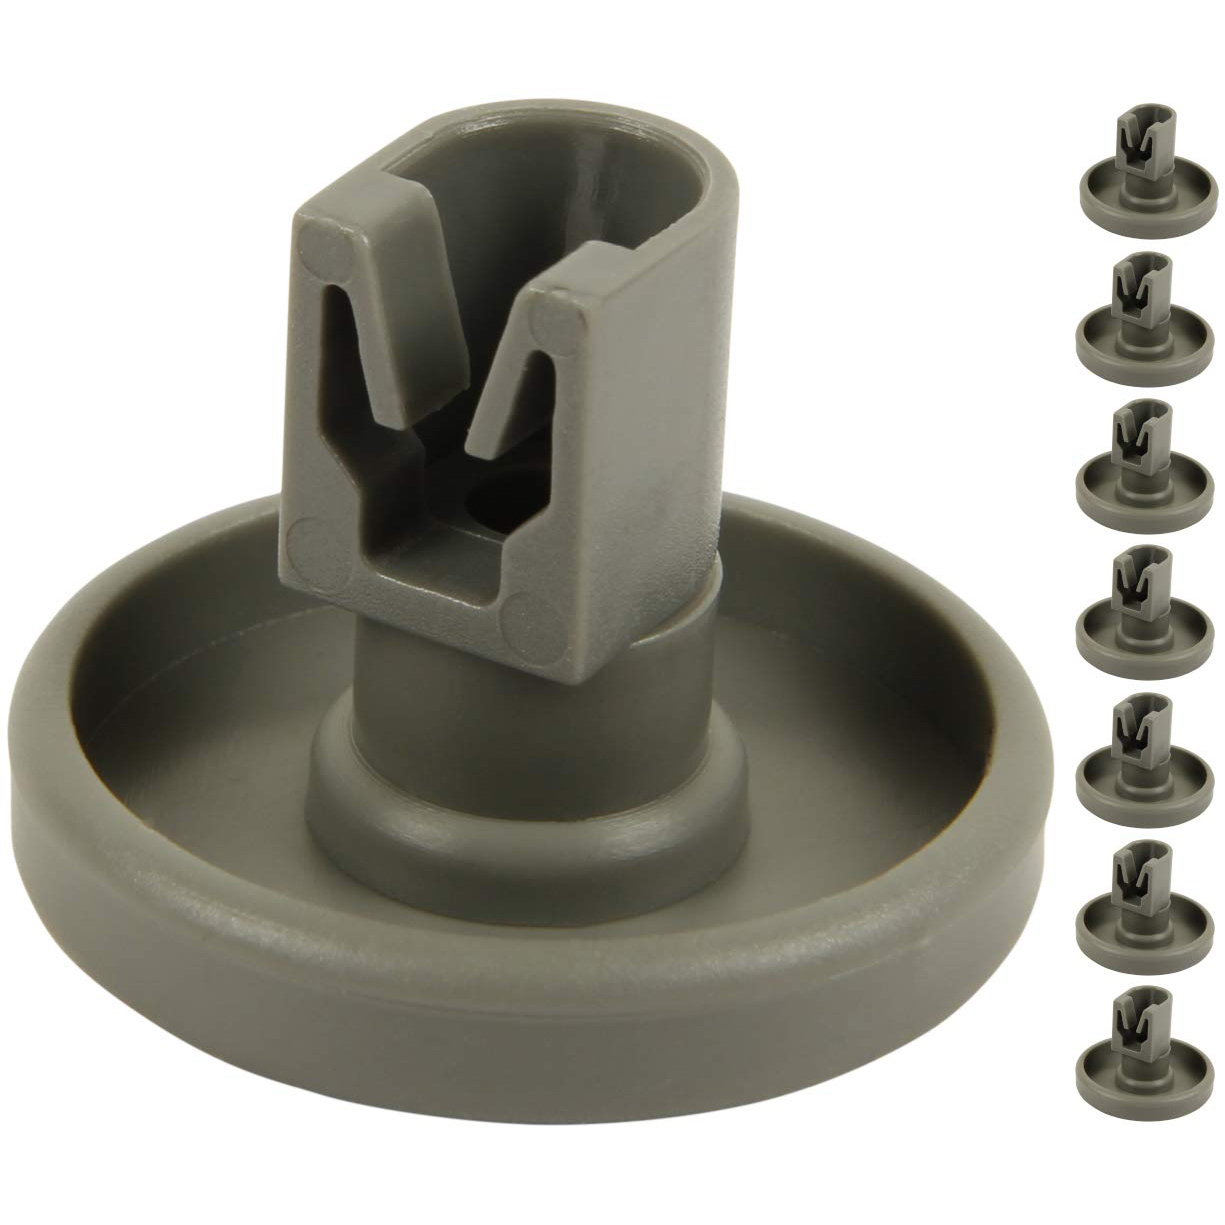 dishwasher-baskets-content-8-pieces-suitable-for-aeg-favorit-privileg-zanussi-etc